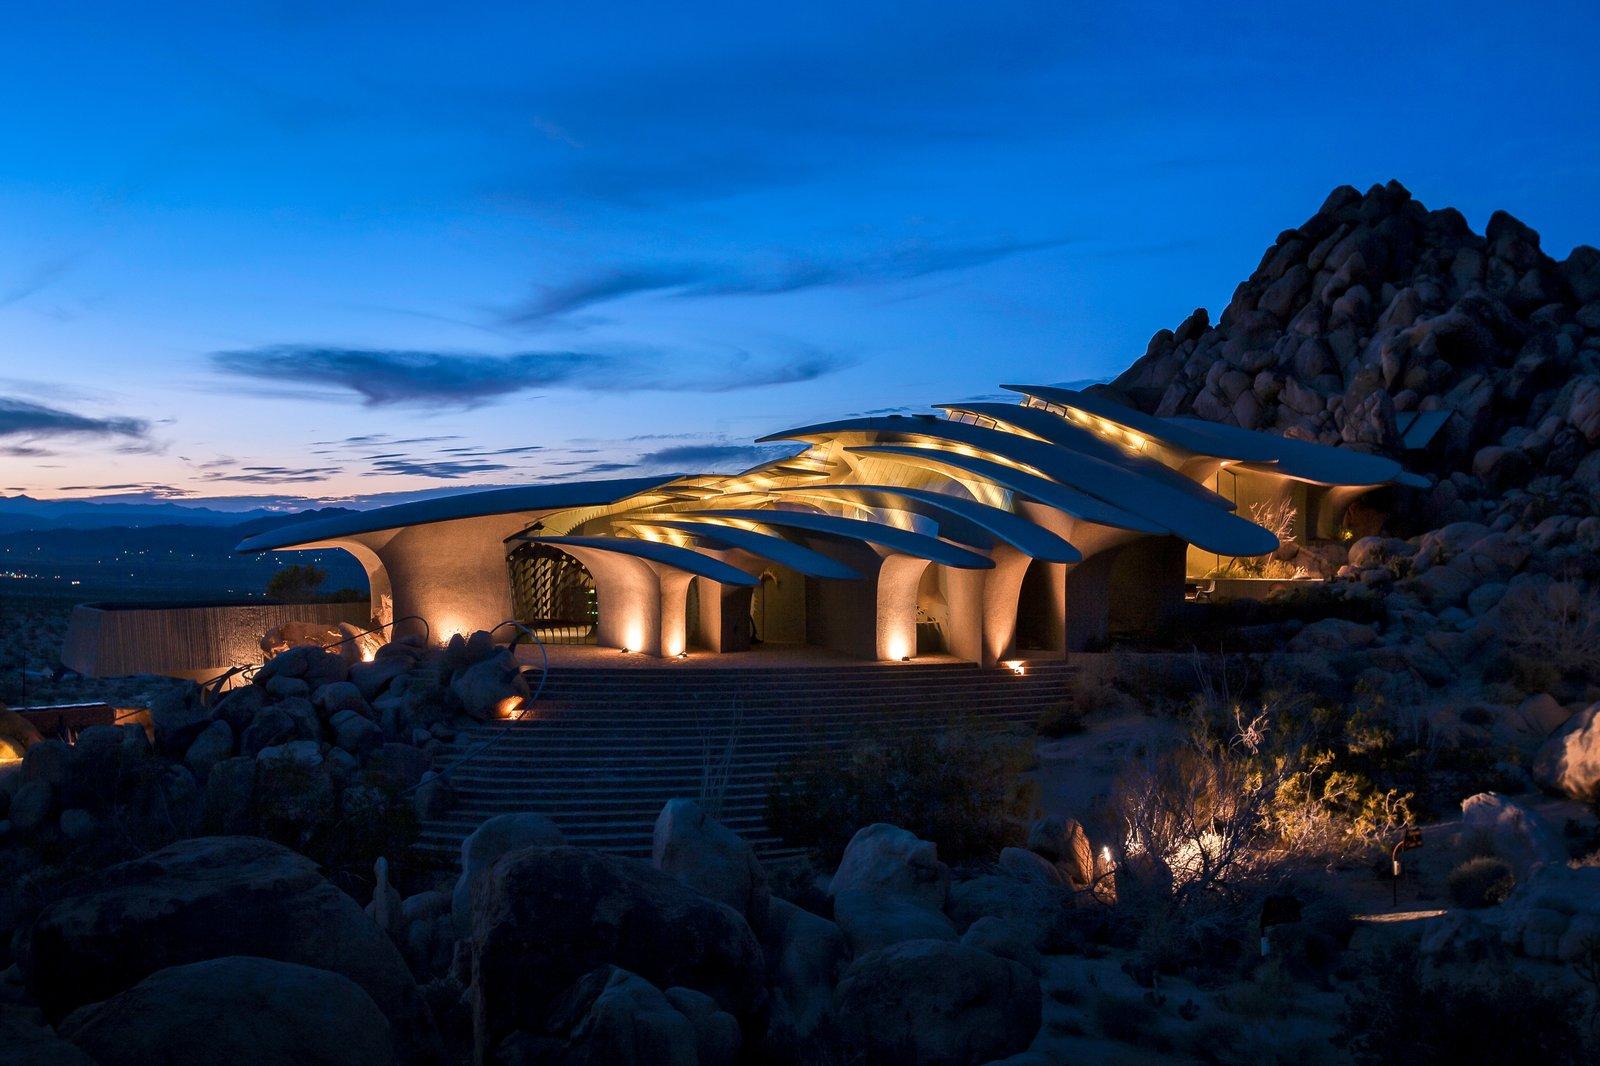 High Desert House exterior at night.